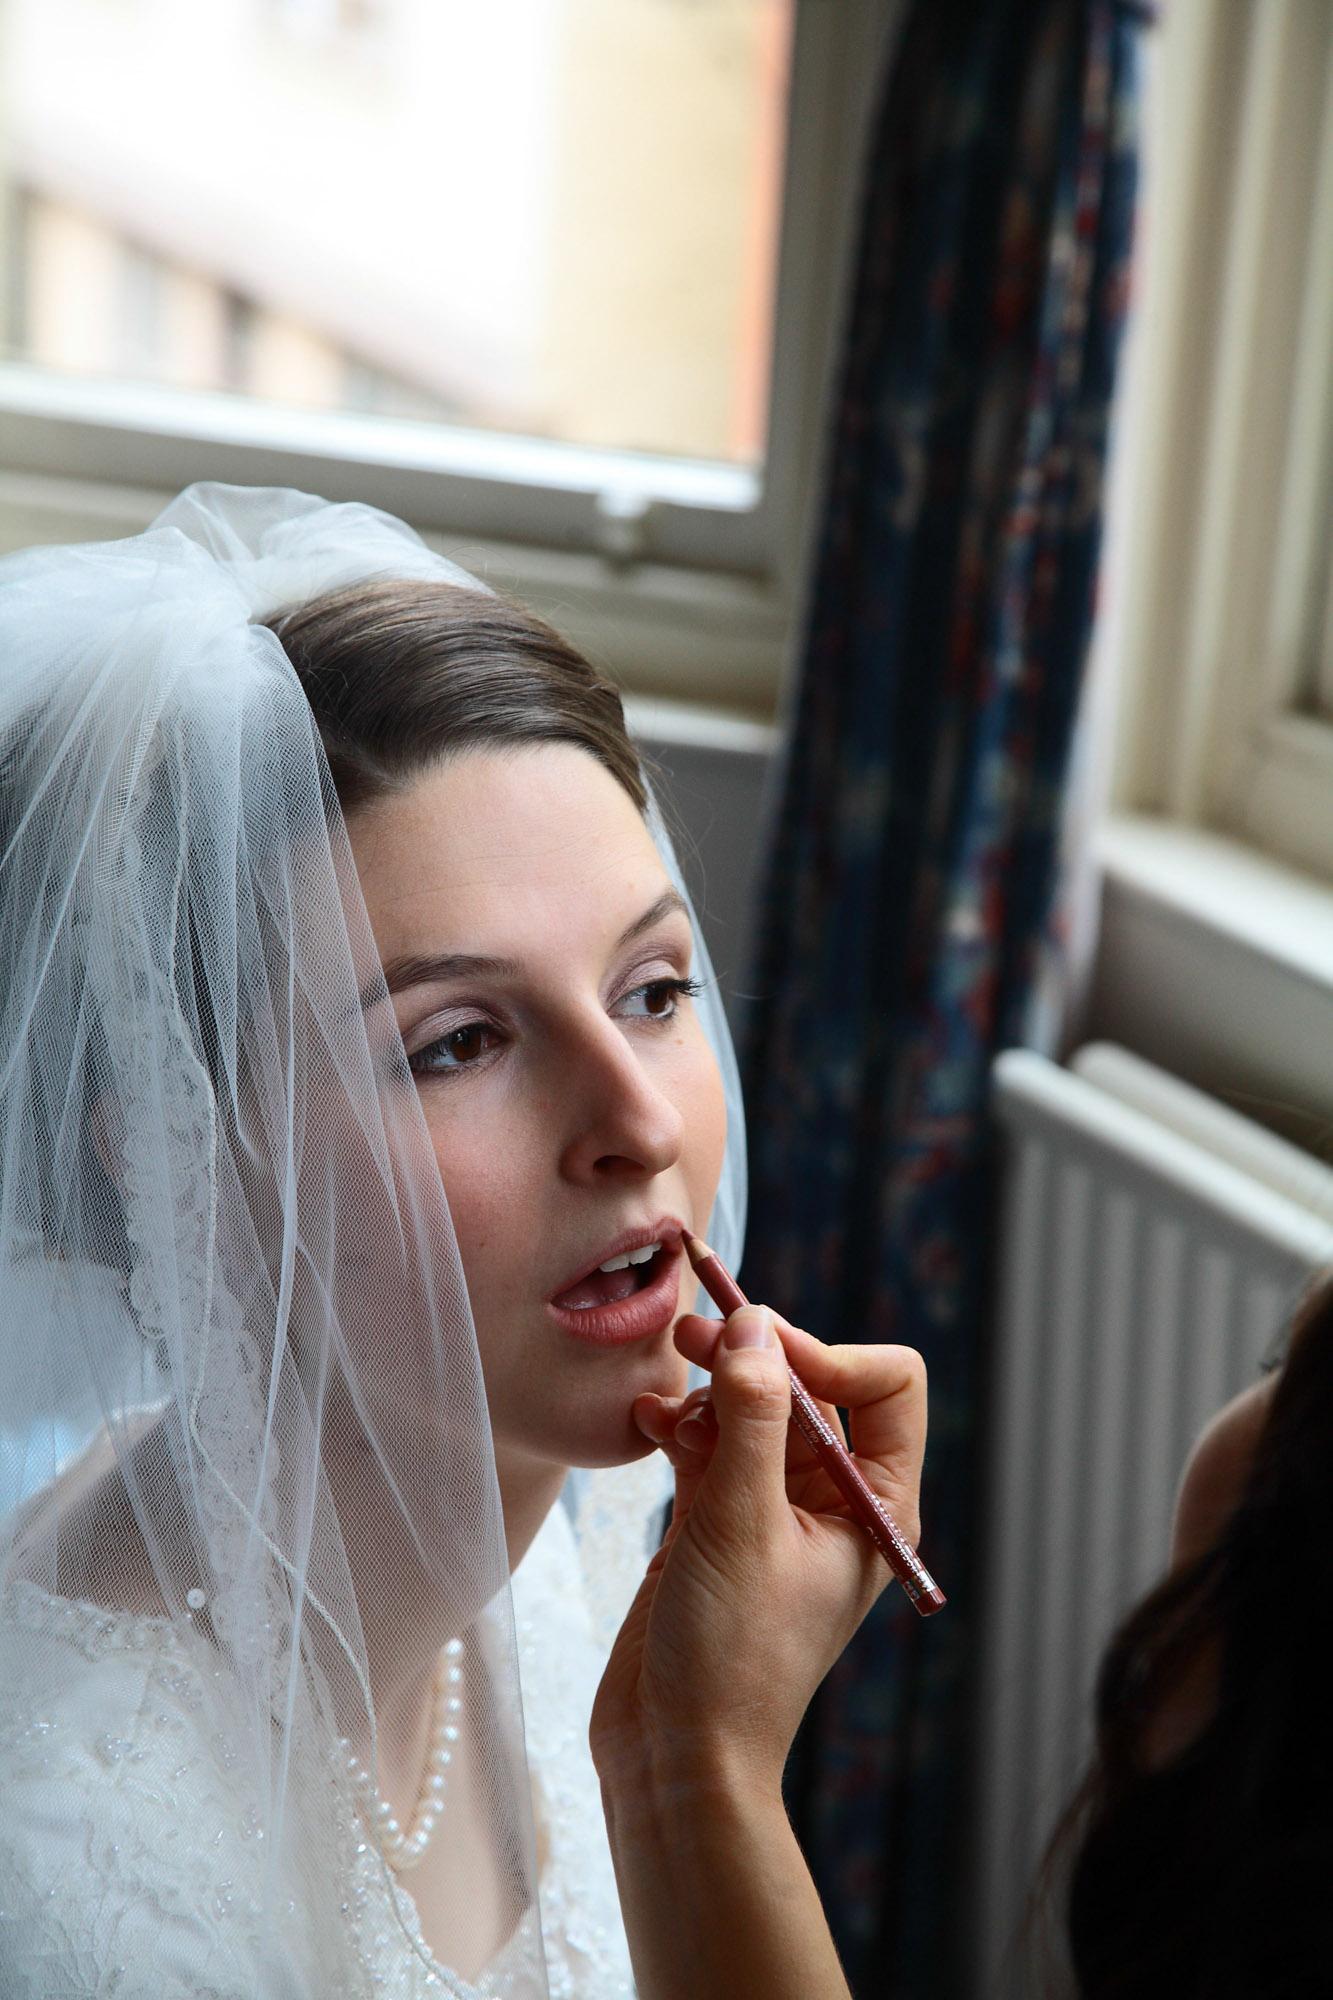 weddings-couples-love-photographer-oxford-london-jonathan-self-photography-5.jpg